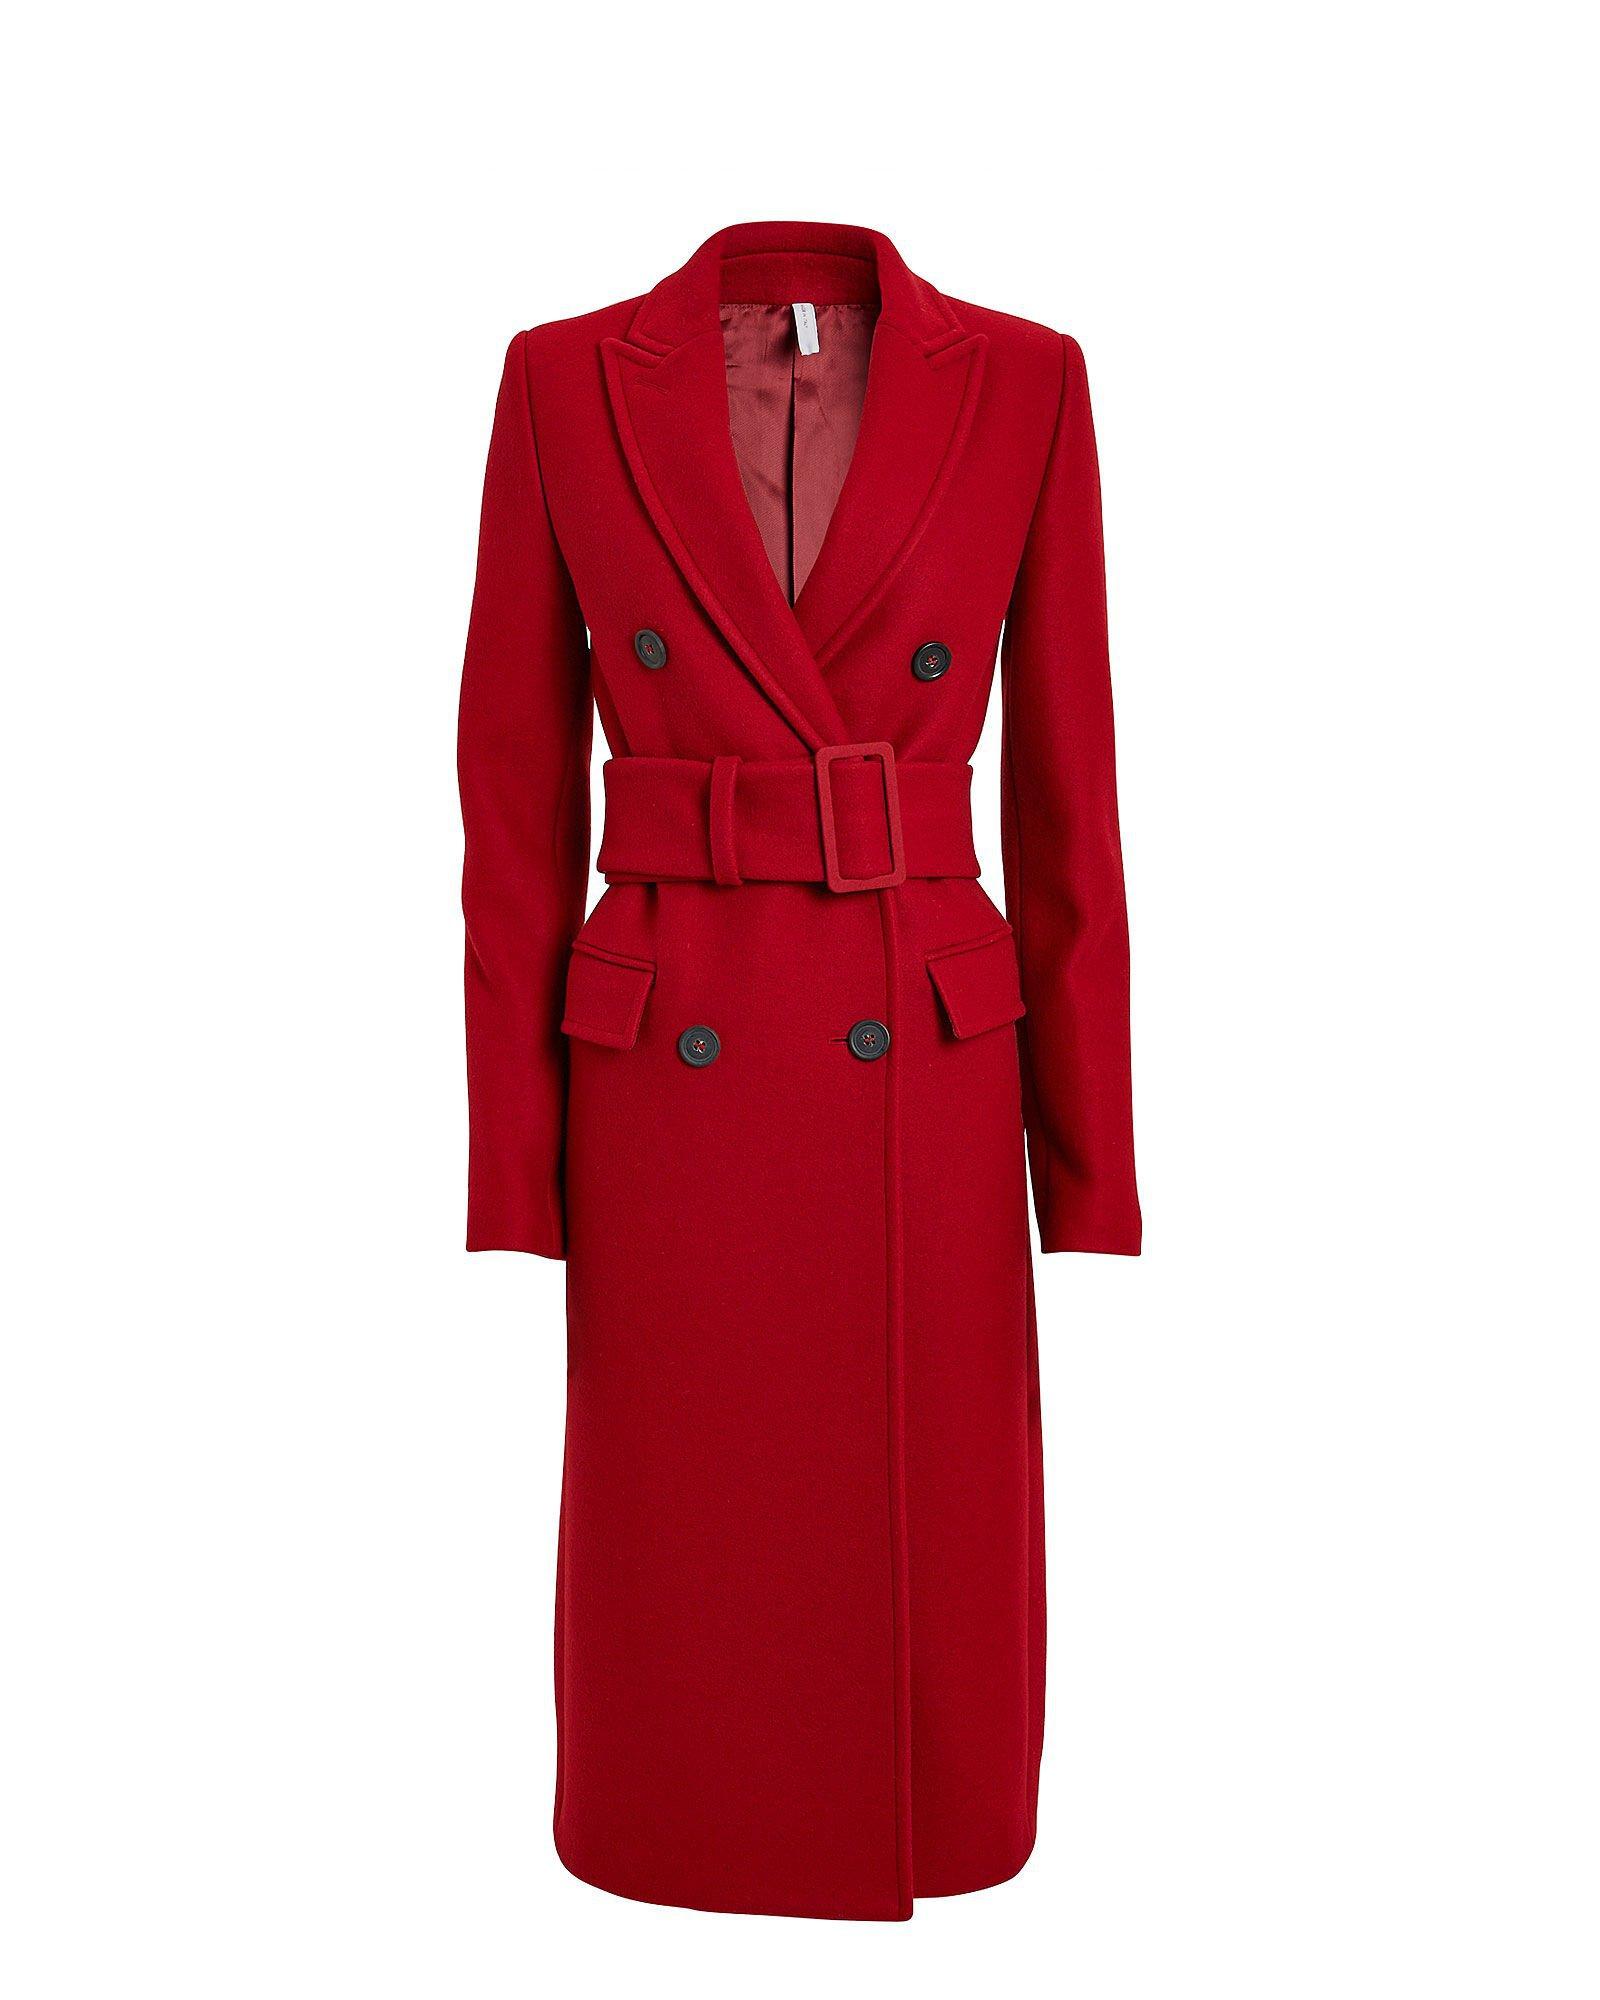 Melton Wool Double Breasted Coat